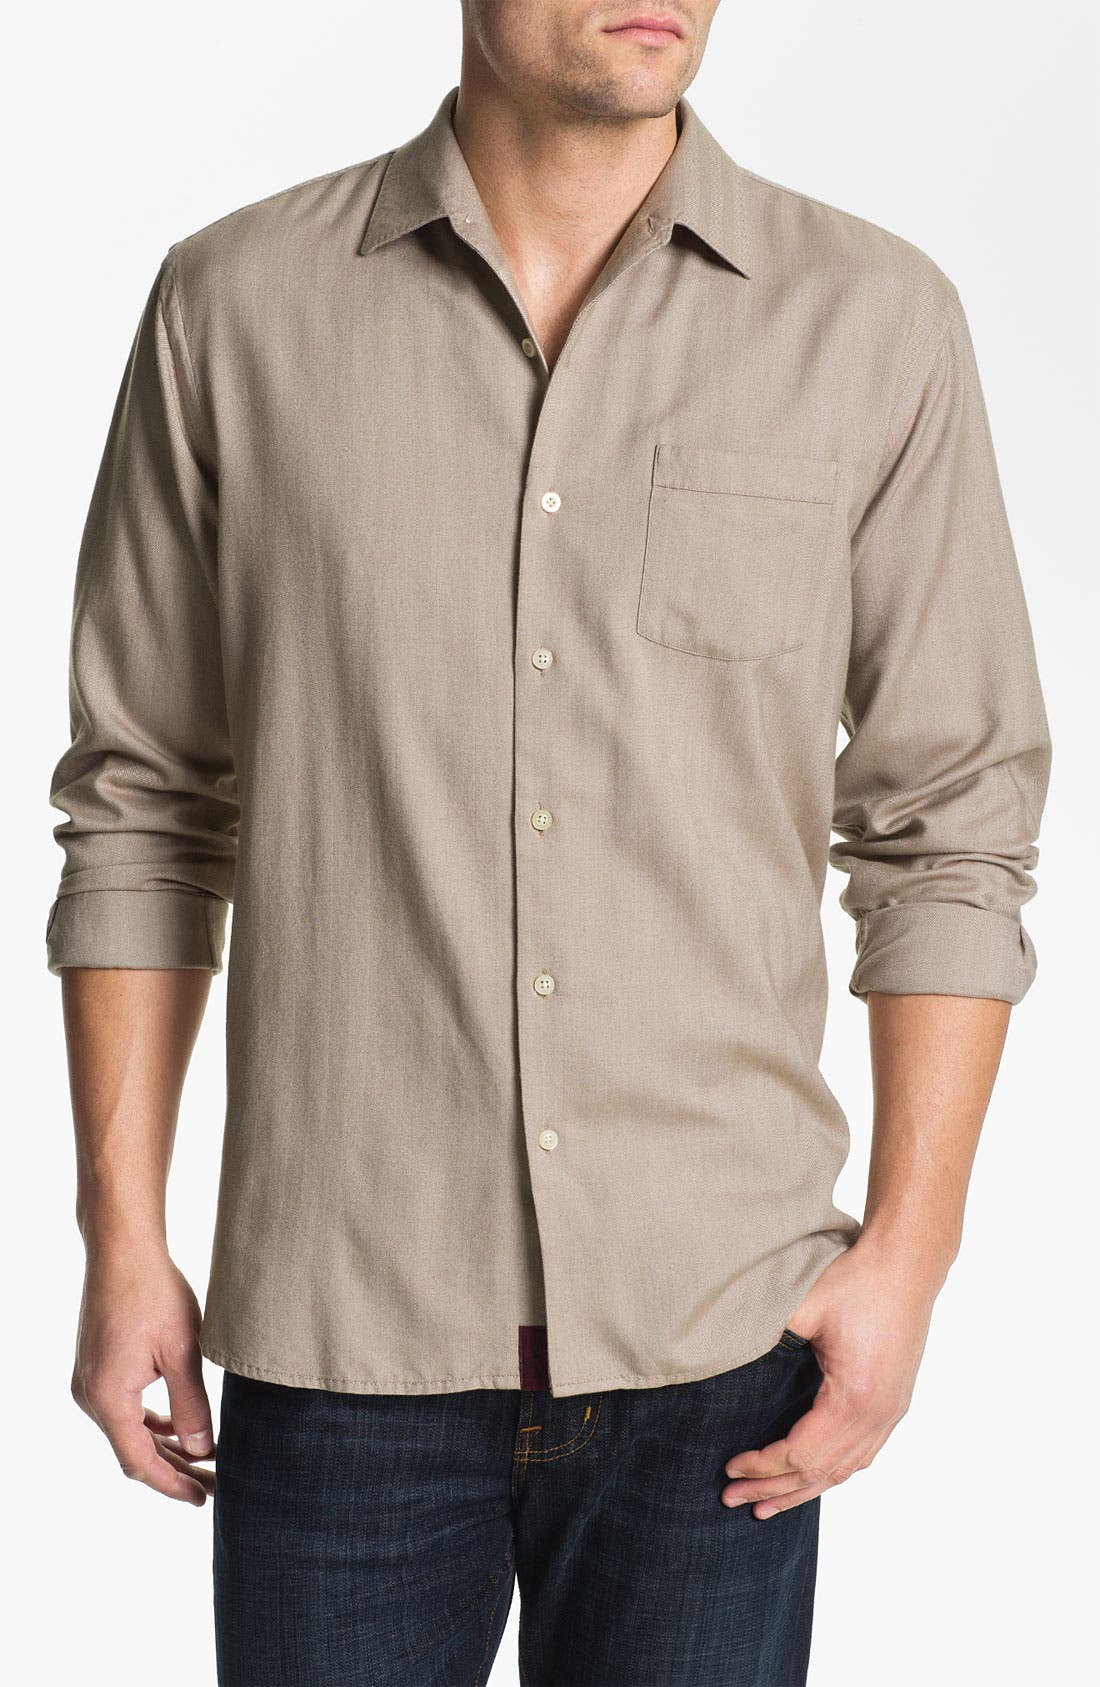 Main Image - Tommy Bahama 'Harbor Island' Silk & Cotton Sport Shirt (Big & Tall)